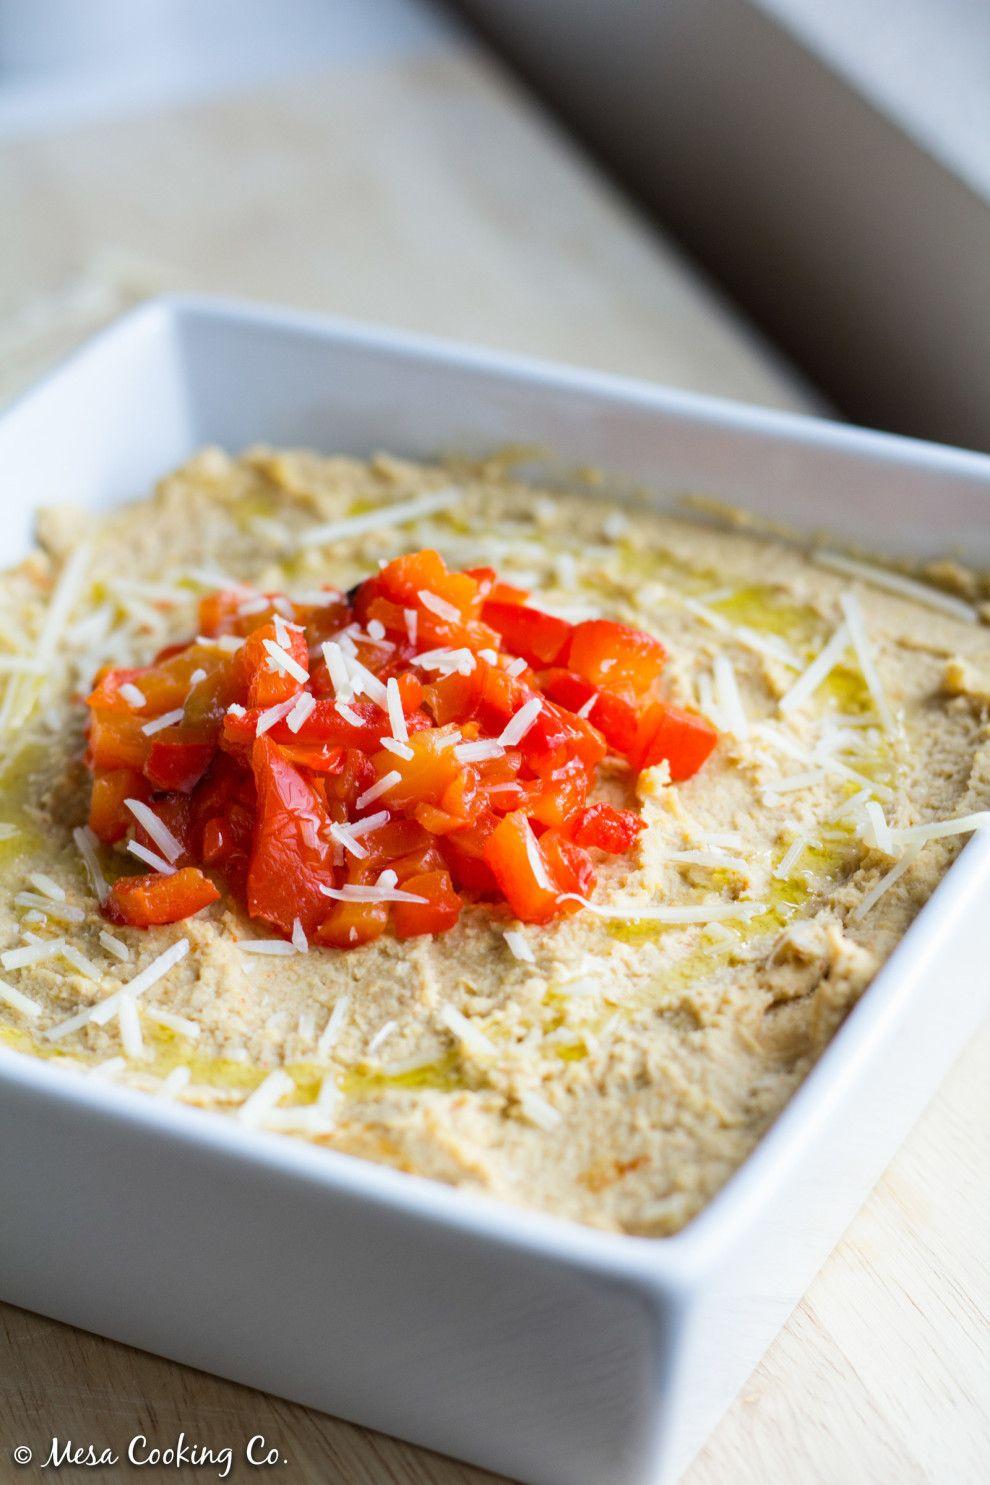 how do you make spicy hummus